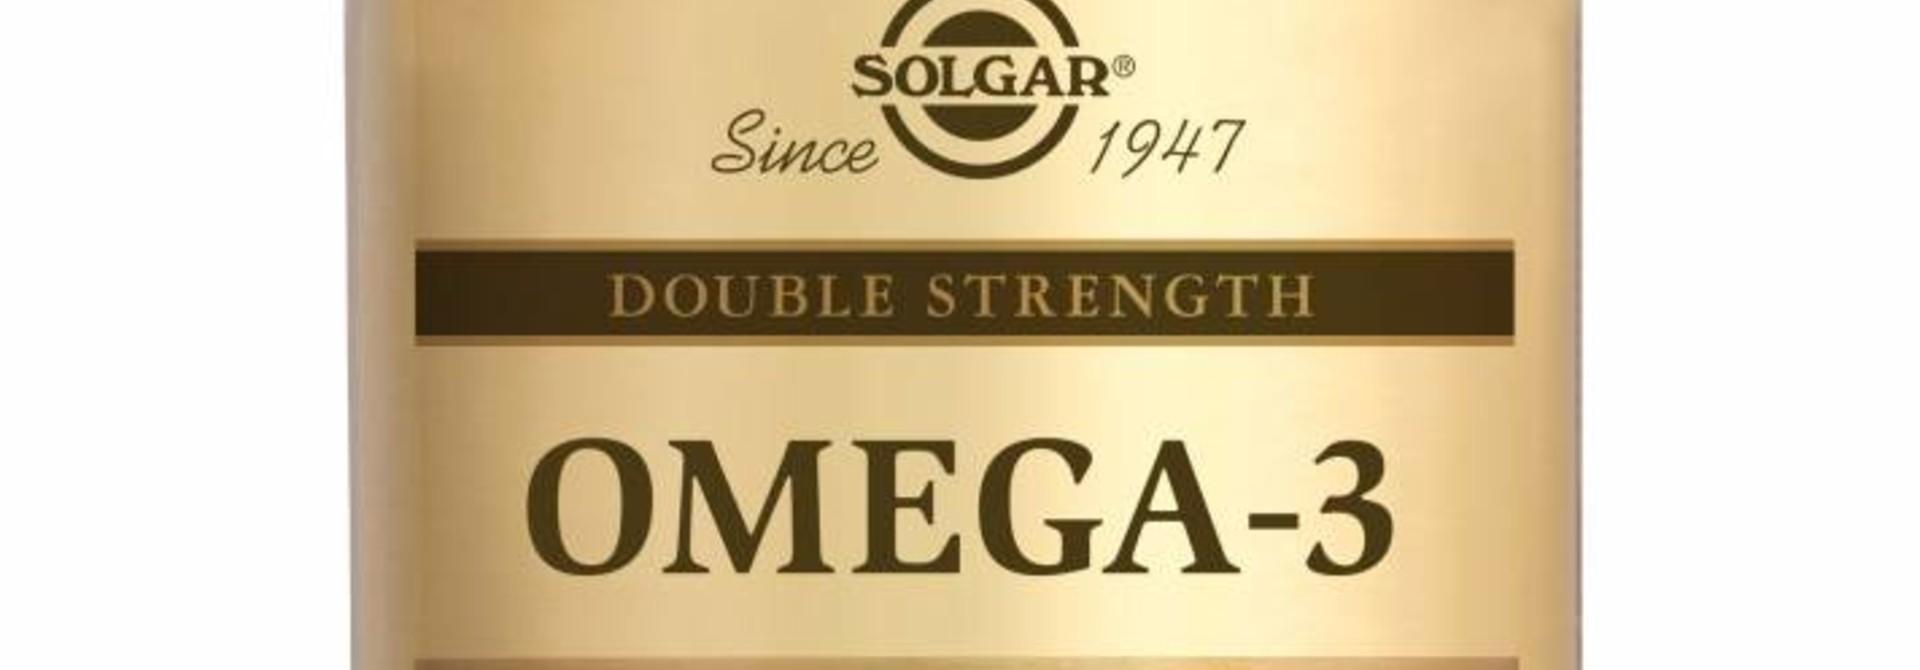 Omega-3 Double Strength 60 softgels